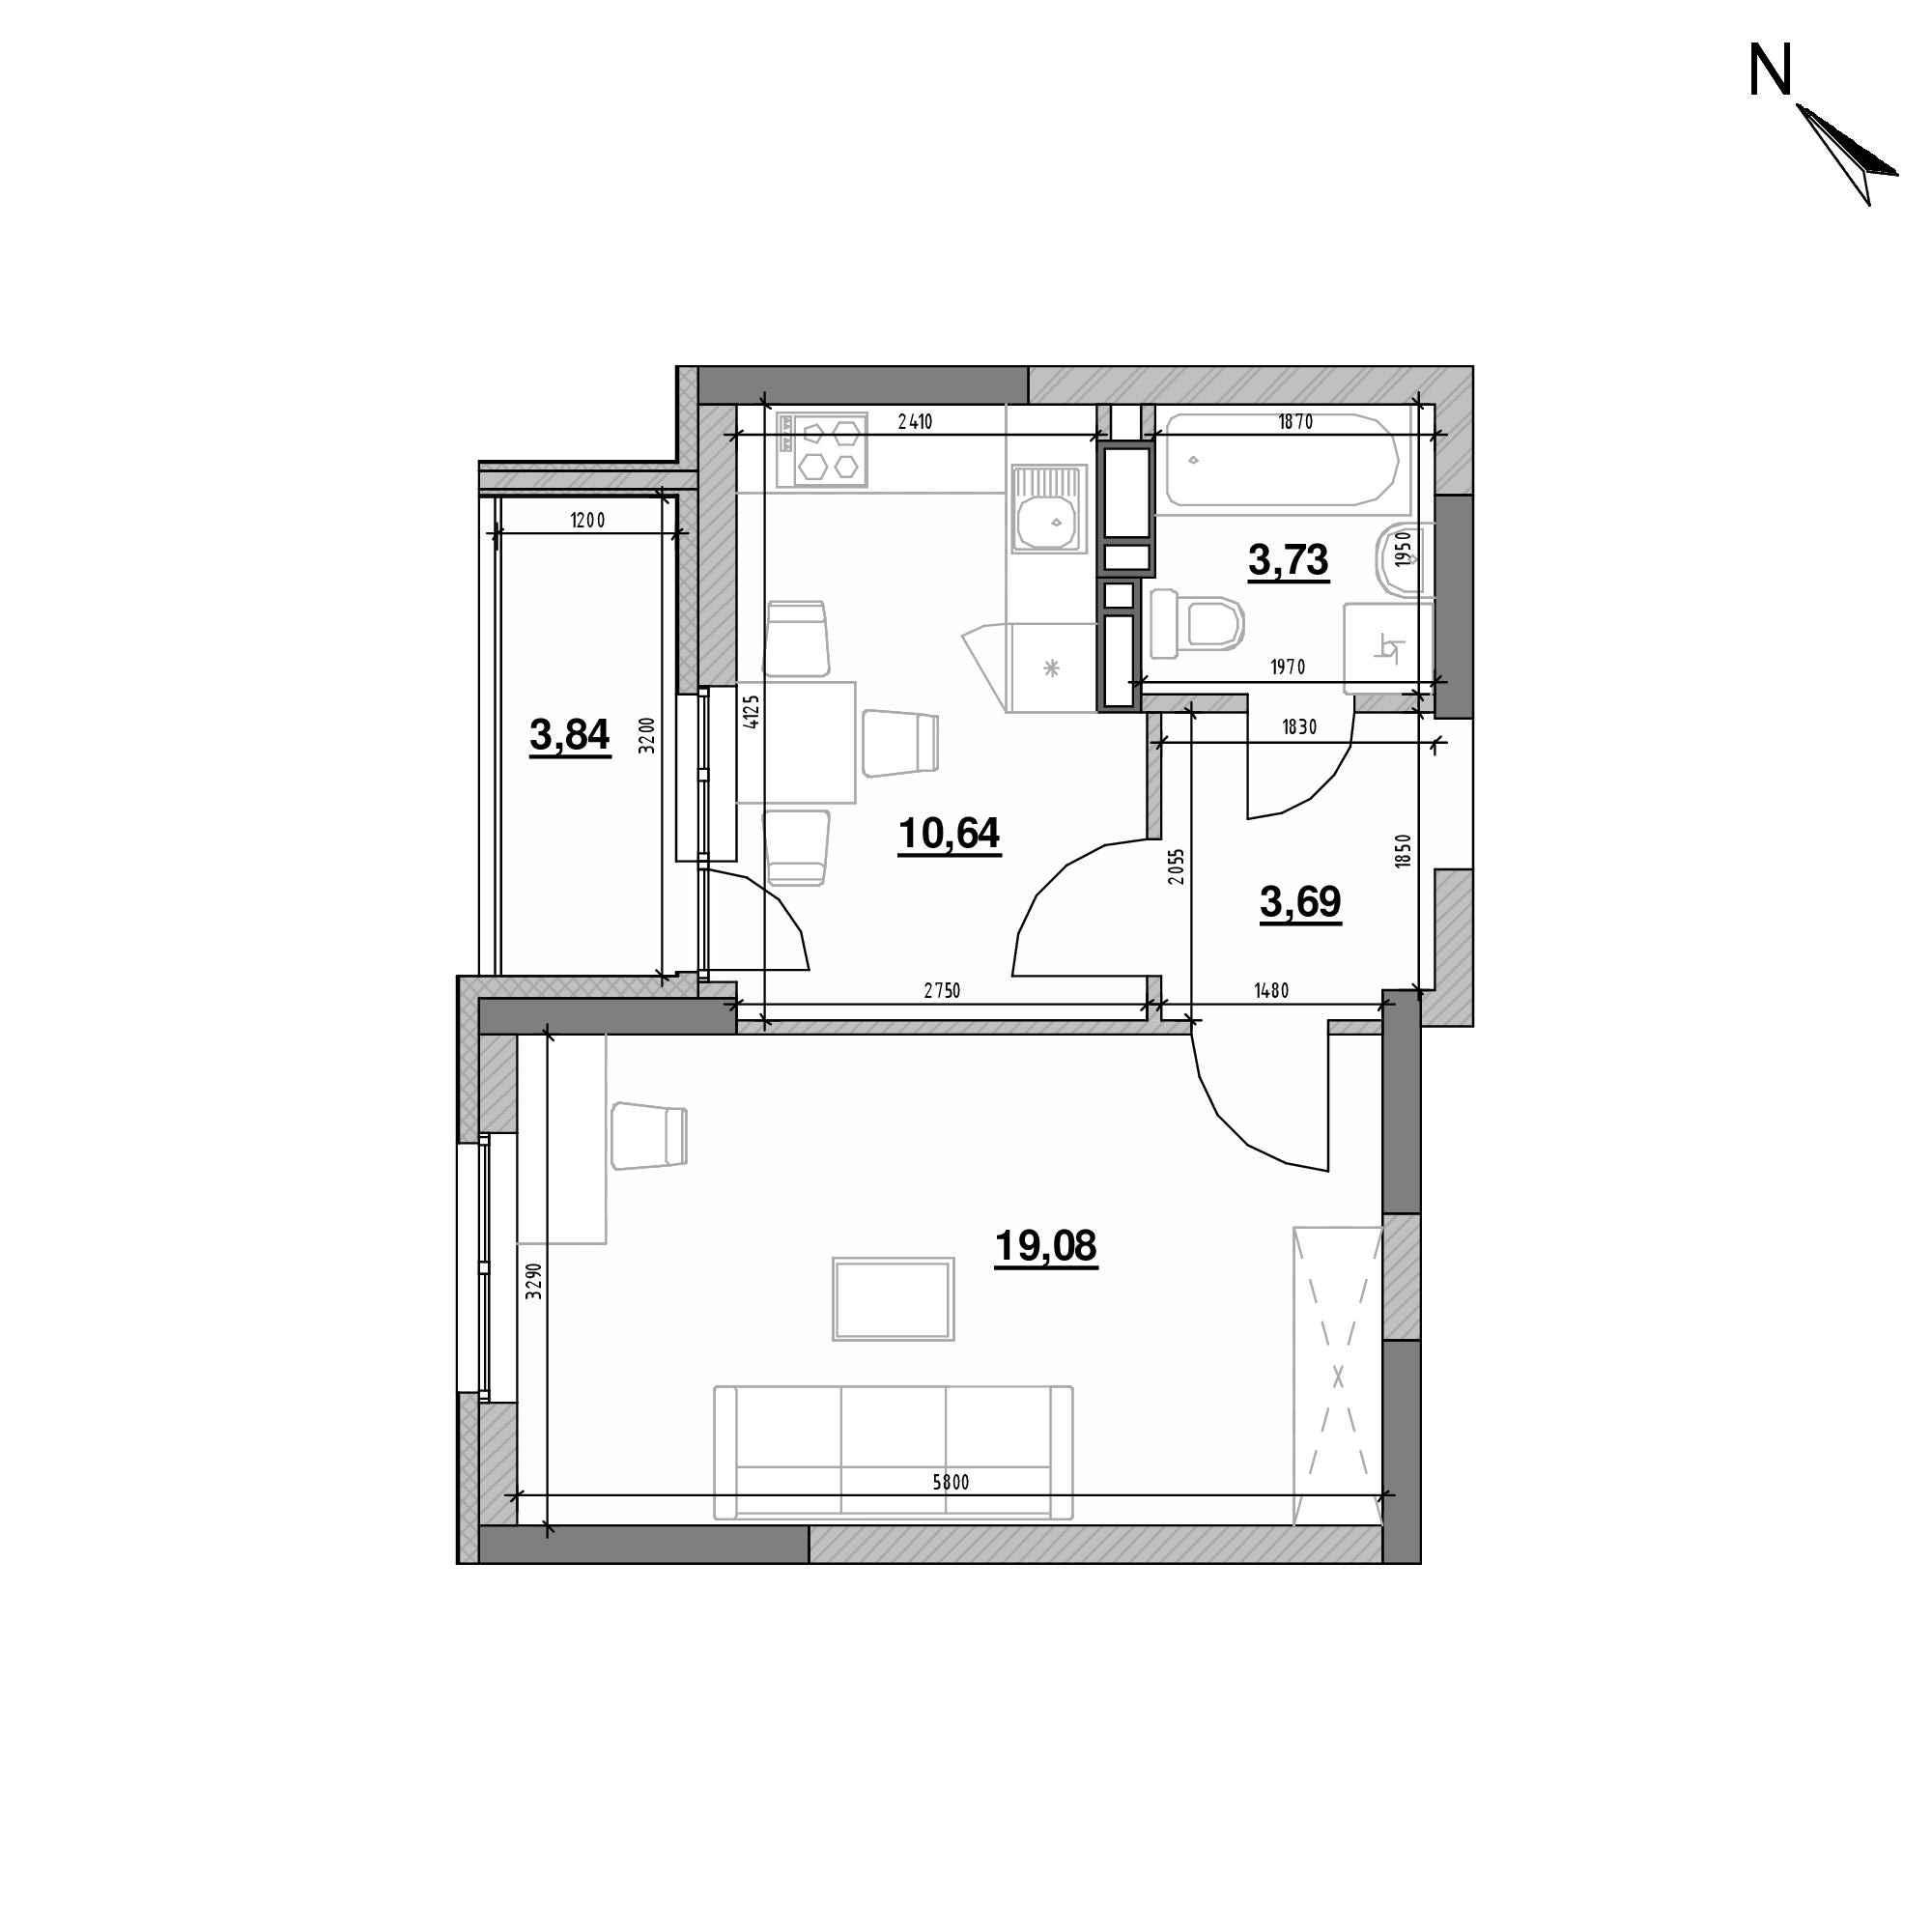 ЖК Оk'Land: планування 1-кімнатної квартири, №234, 40.98 м<sup>2</sup>